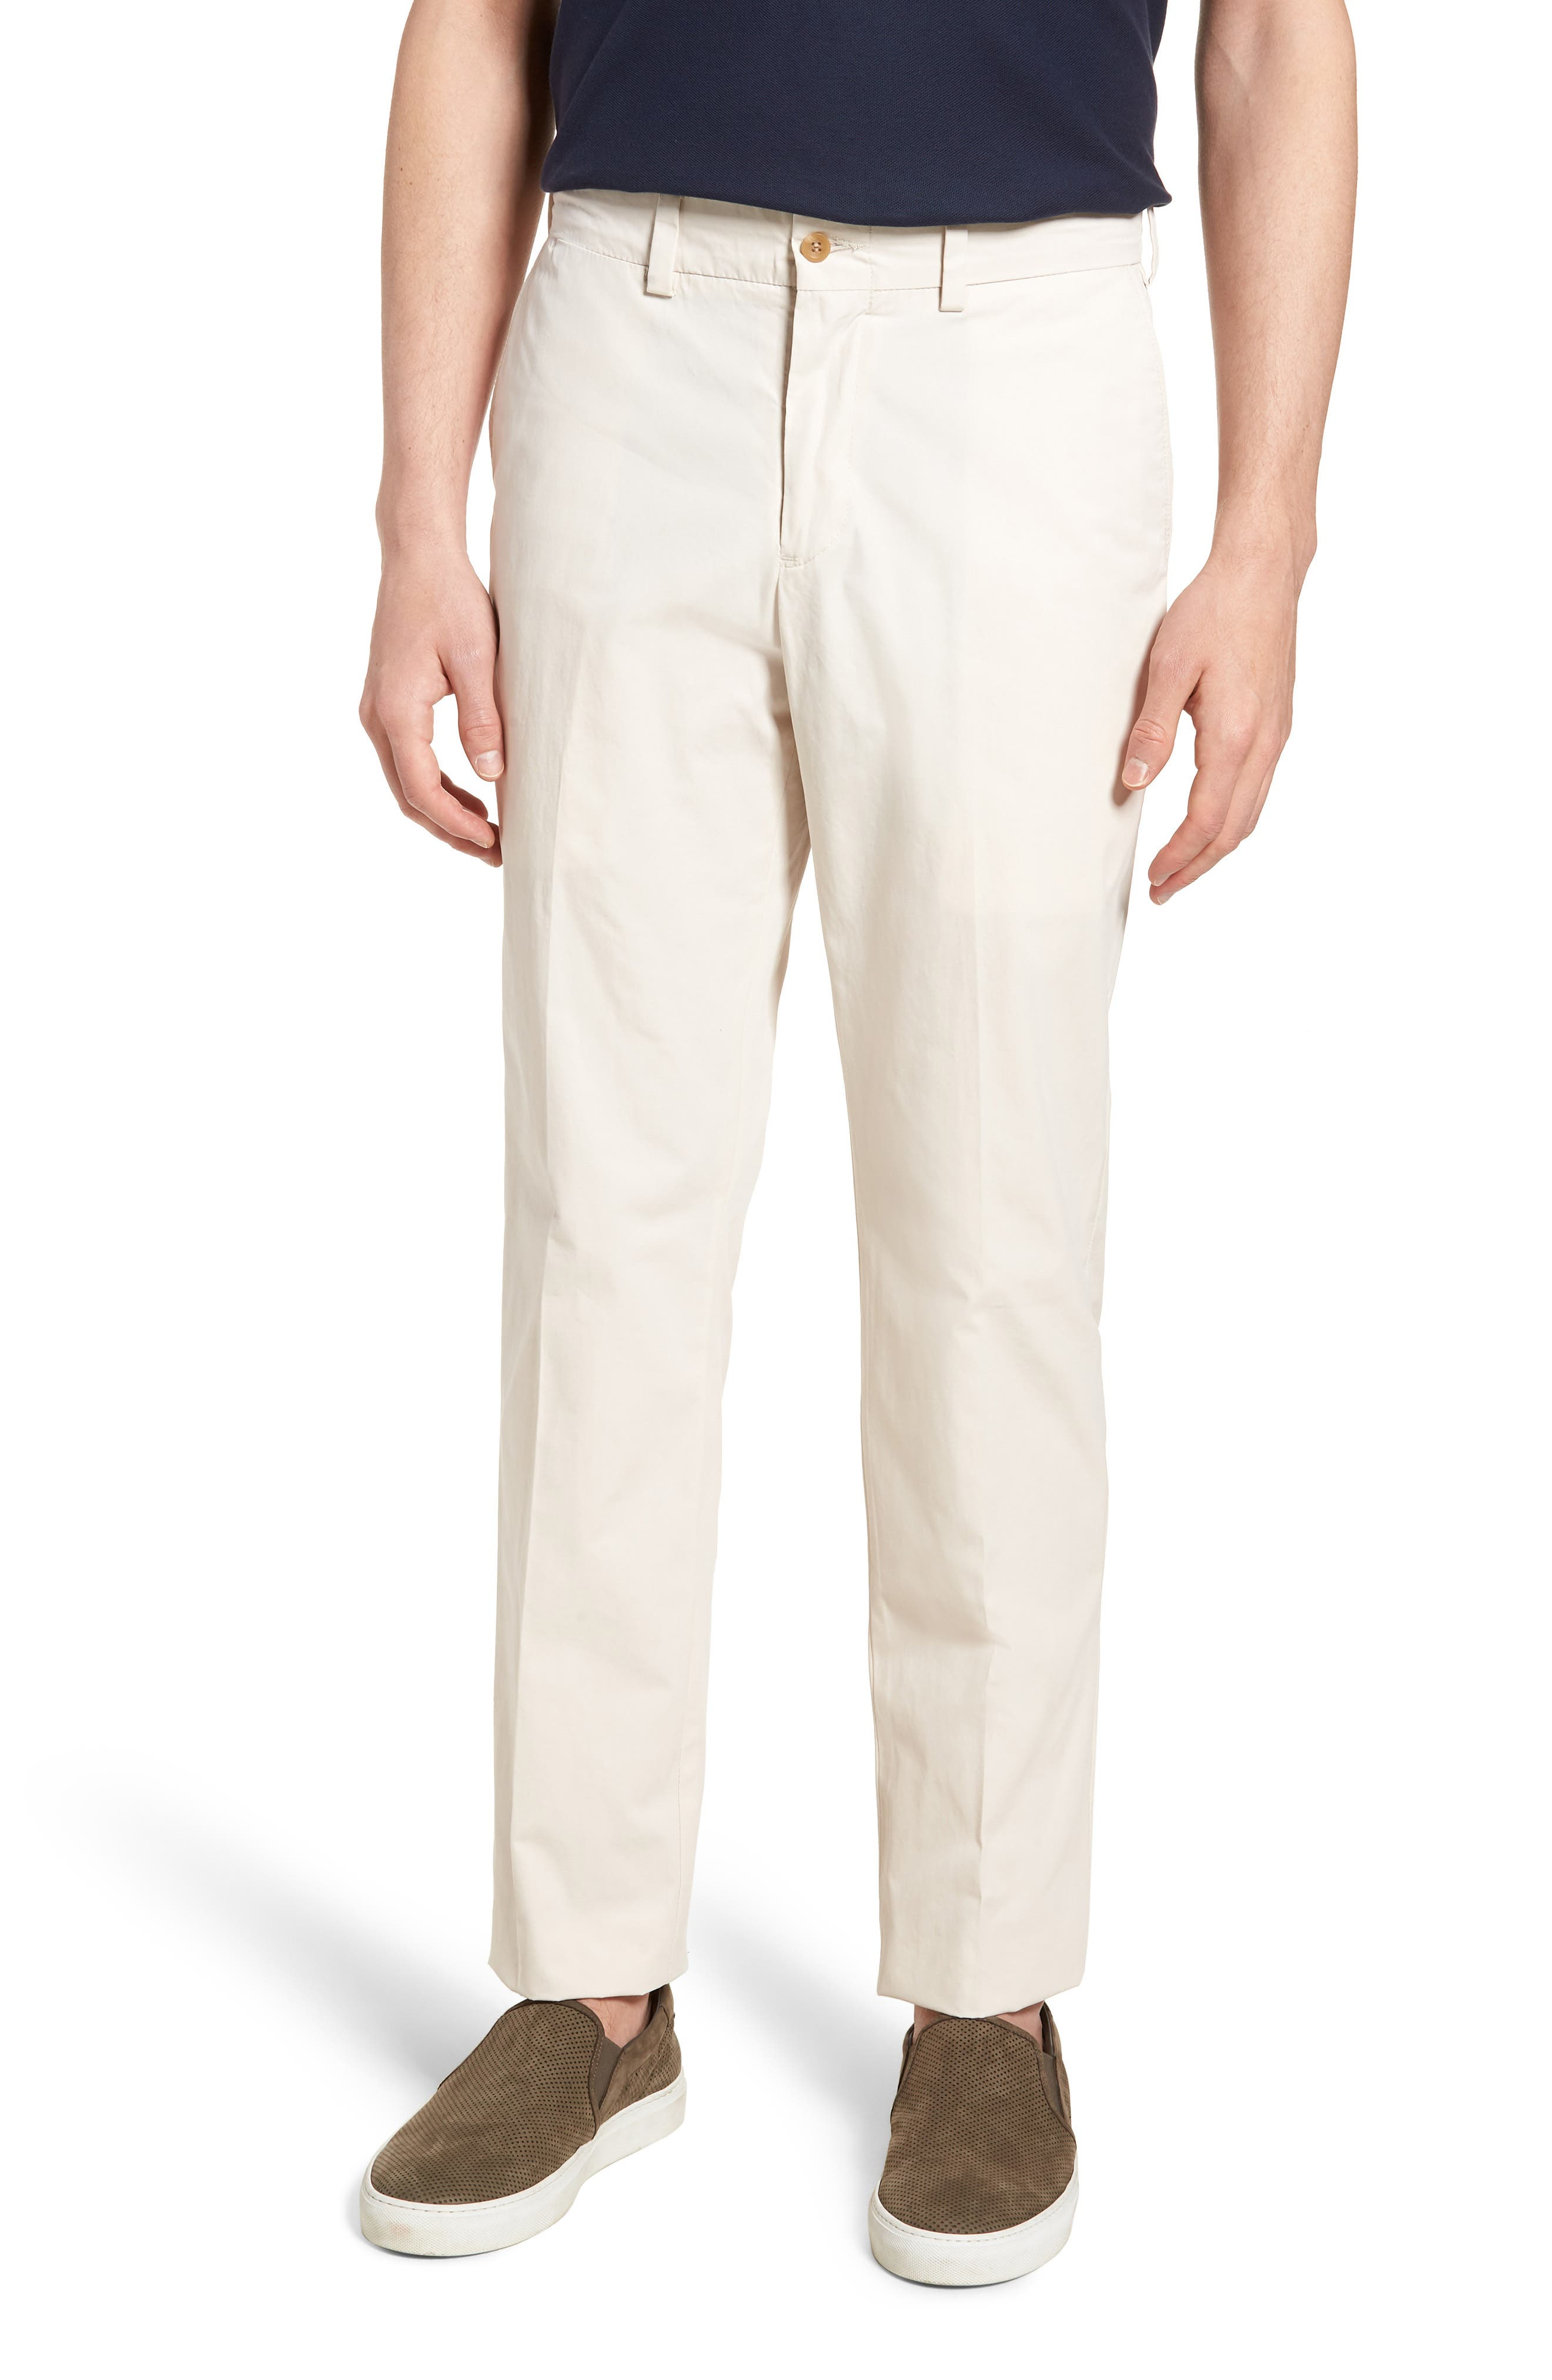 Bills Khakis M3 Straight Fit Flat Front Tropical Poplin Pants